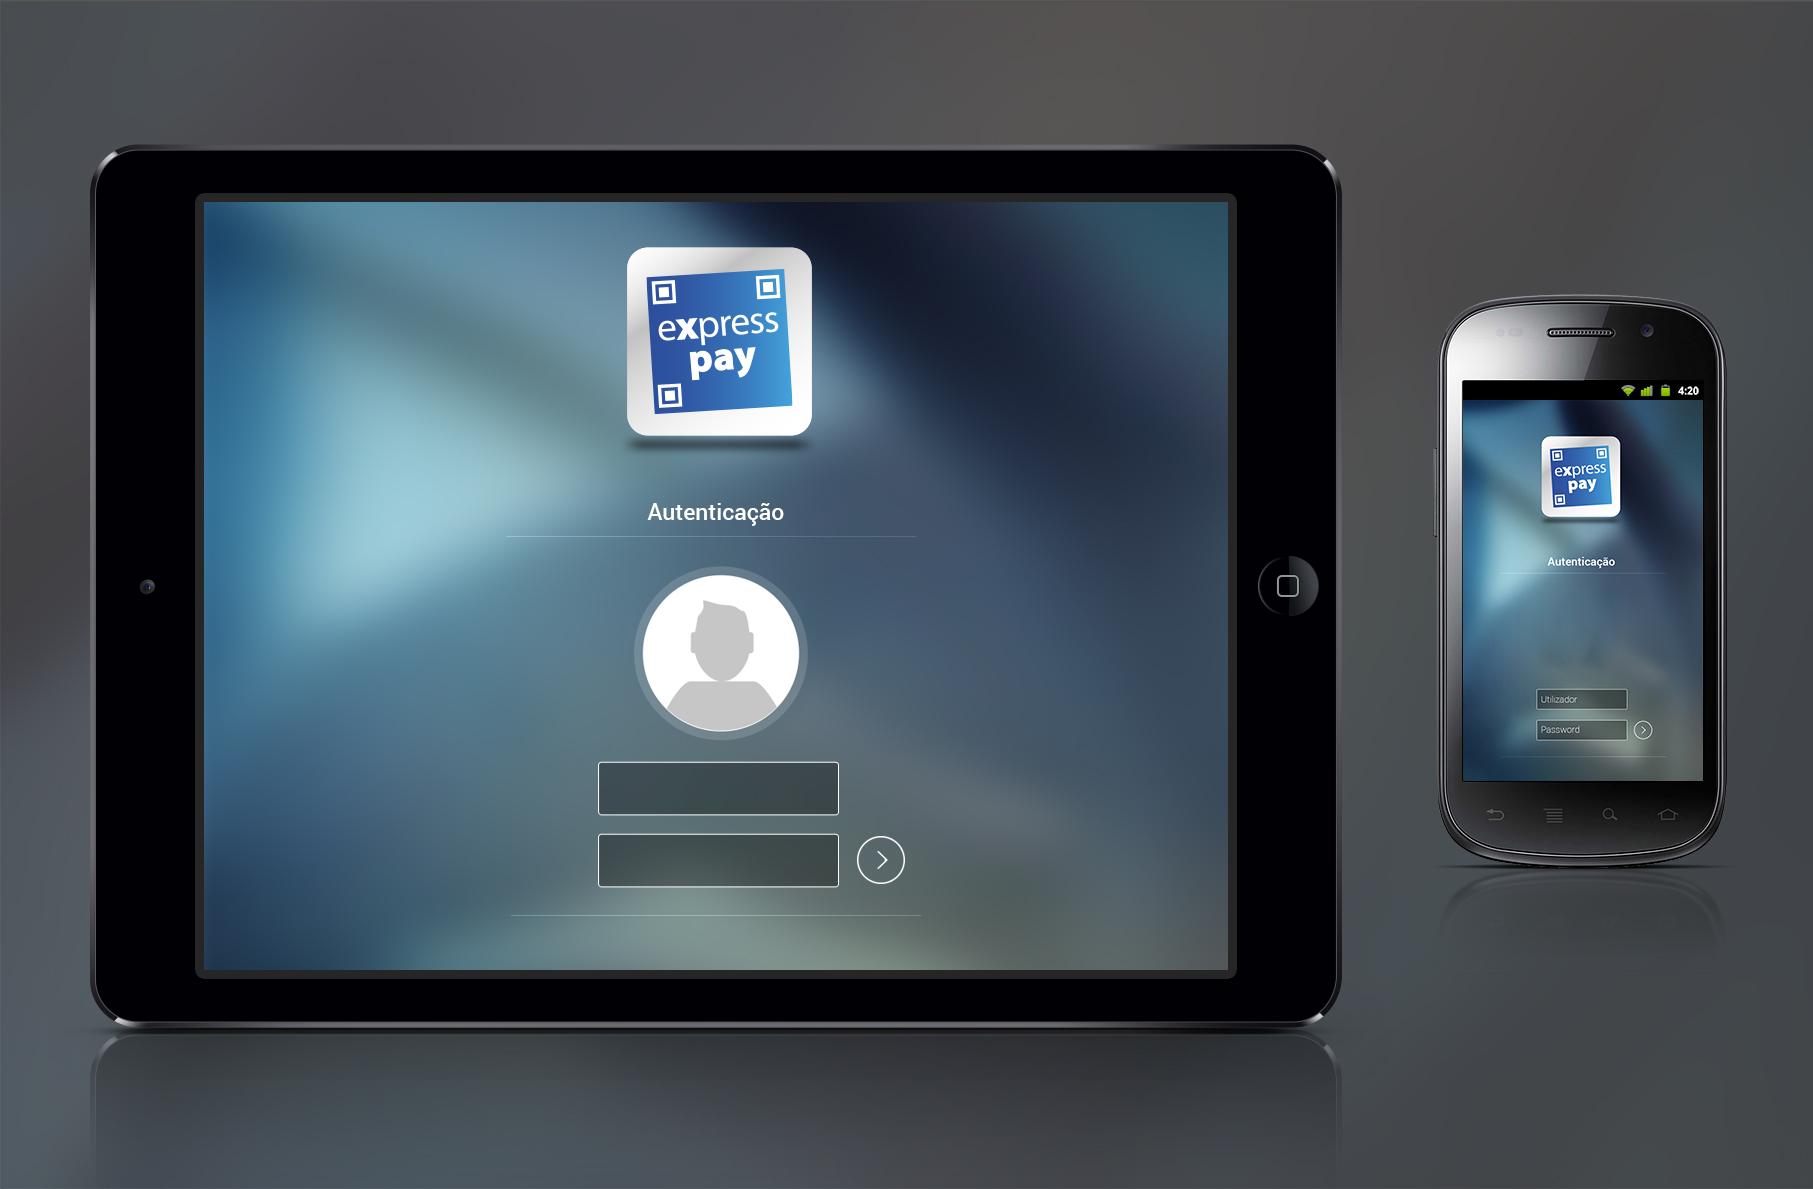 express pay interface